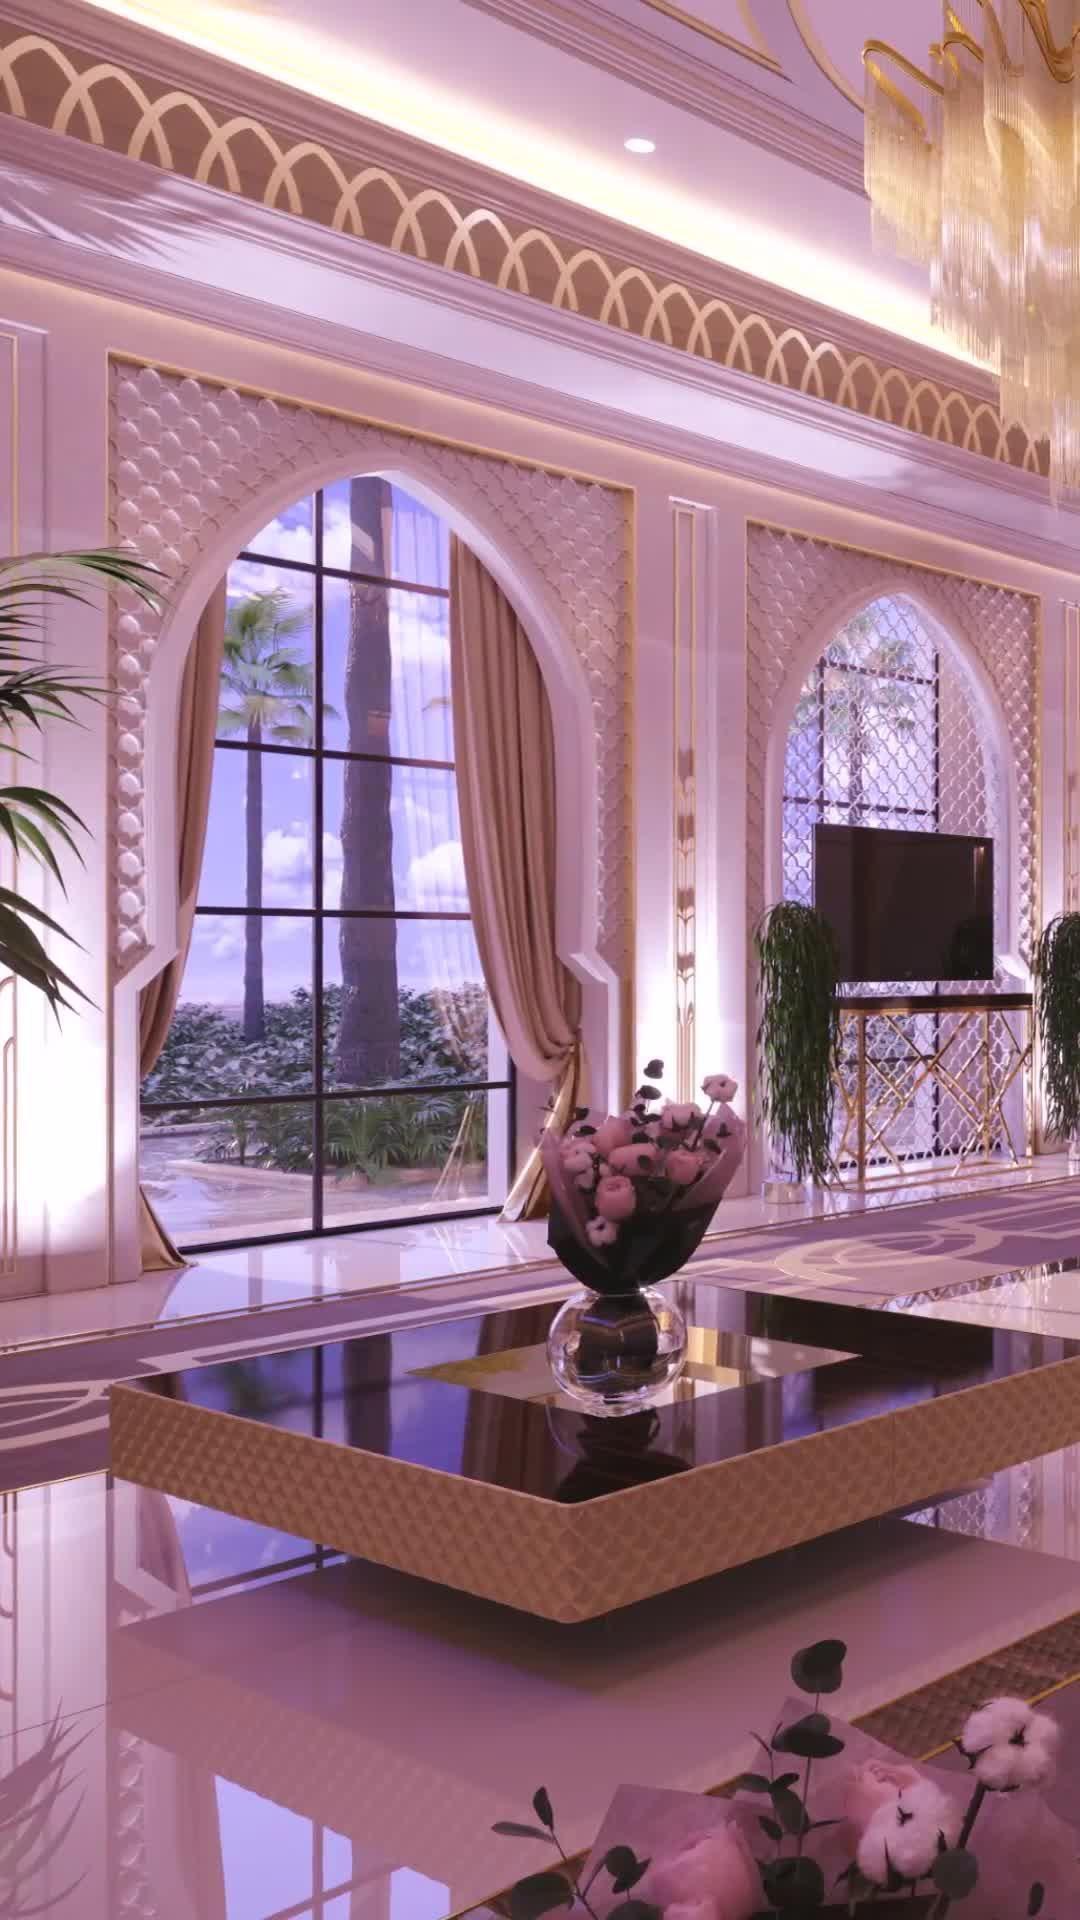 Luxury mansion majlis interior design in Dubai - V